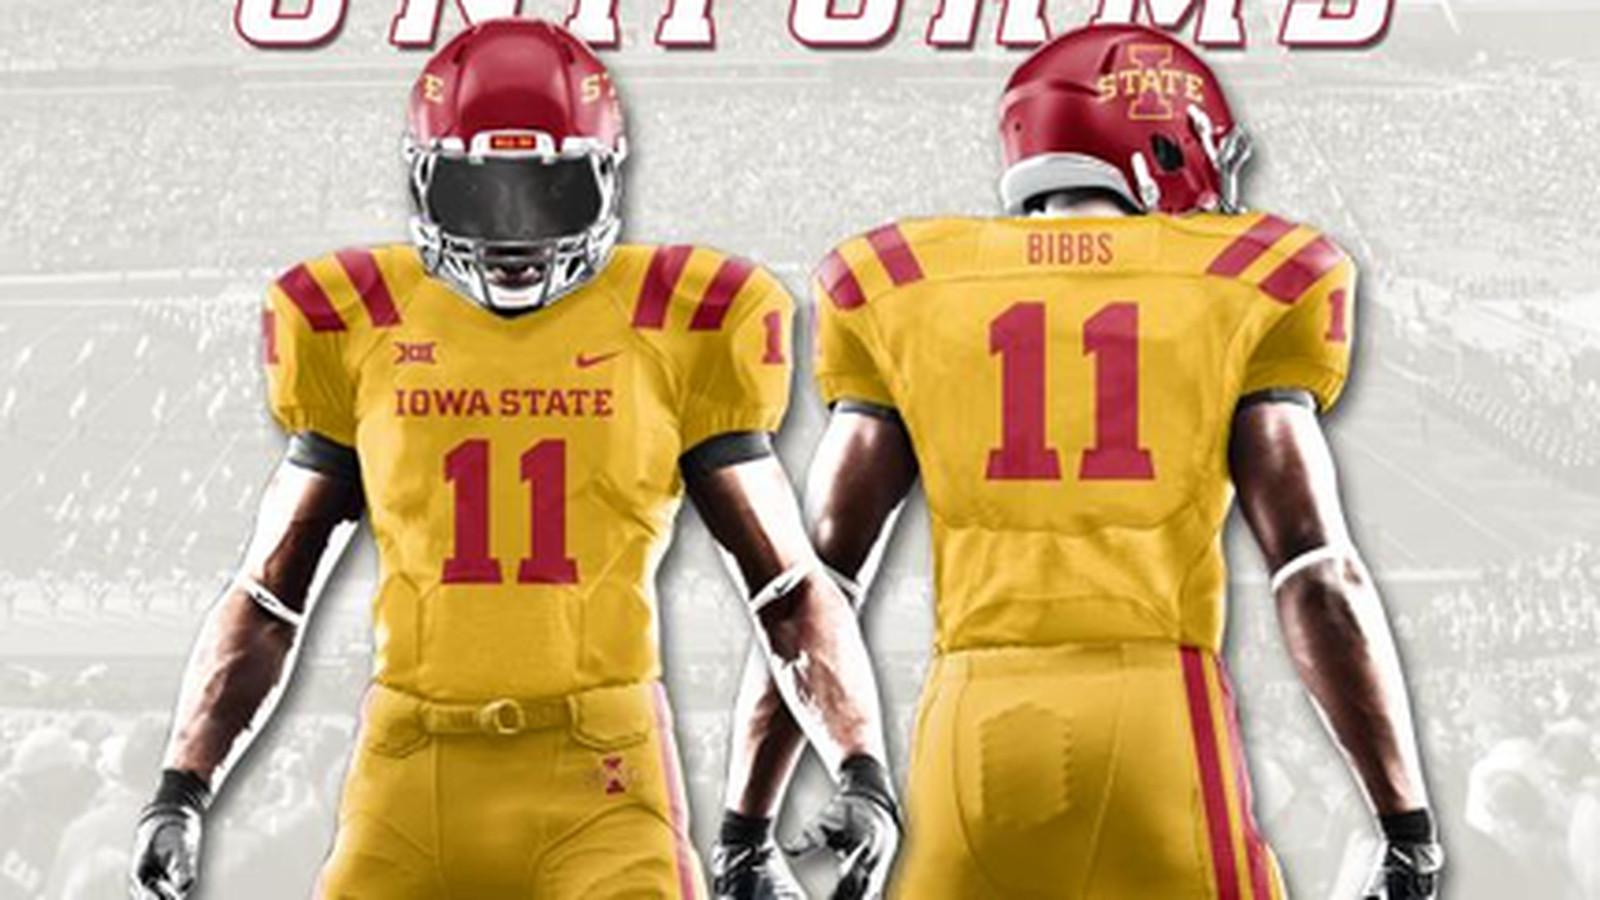 Mcdonald S Brings Iowa State Uniform Joke To Life